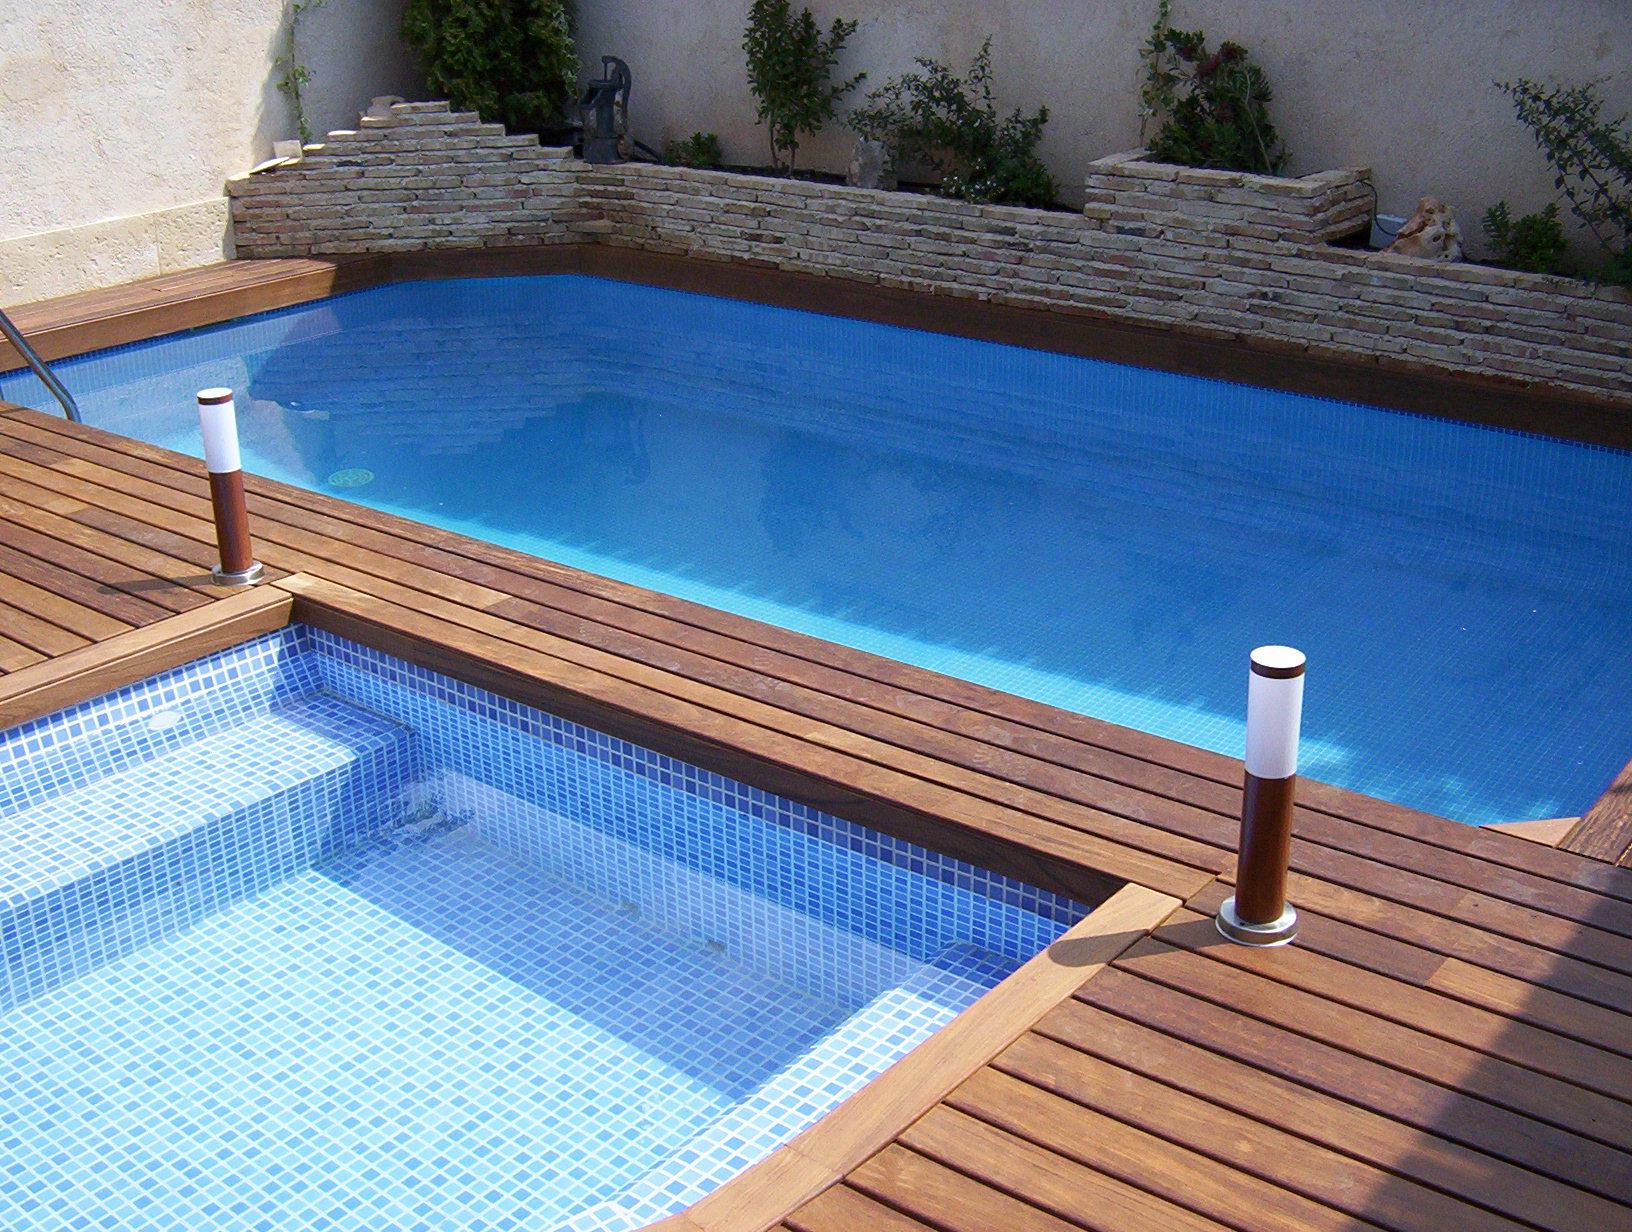 Tarima de ipe en piscina de exterior en Alcobendas - Topmadera